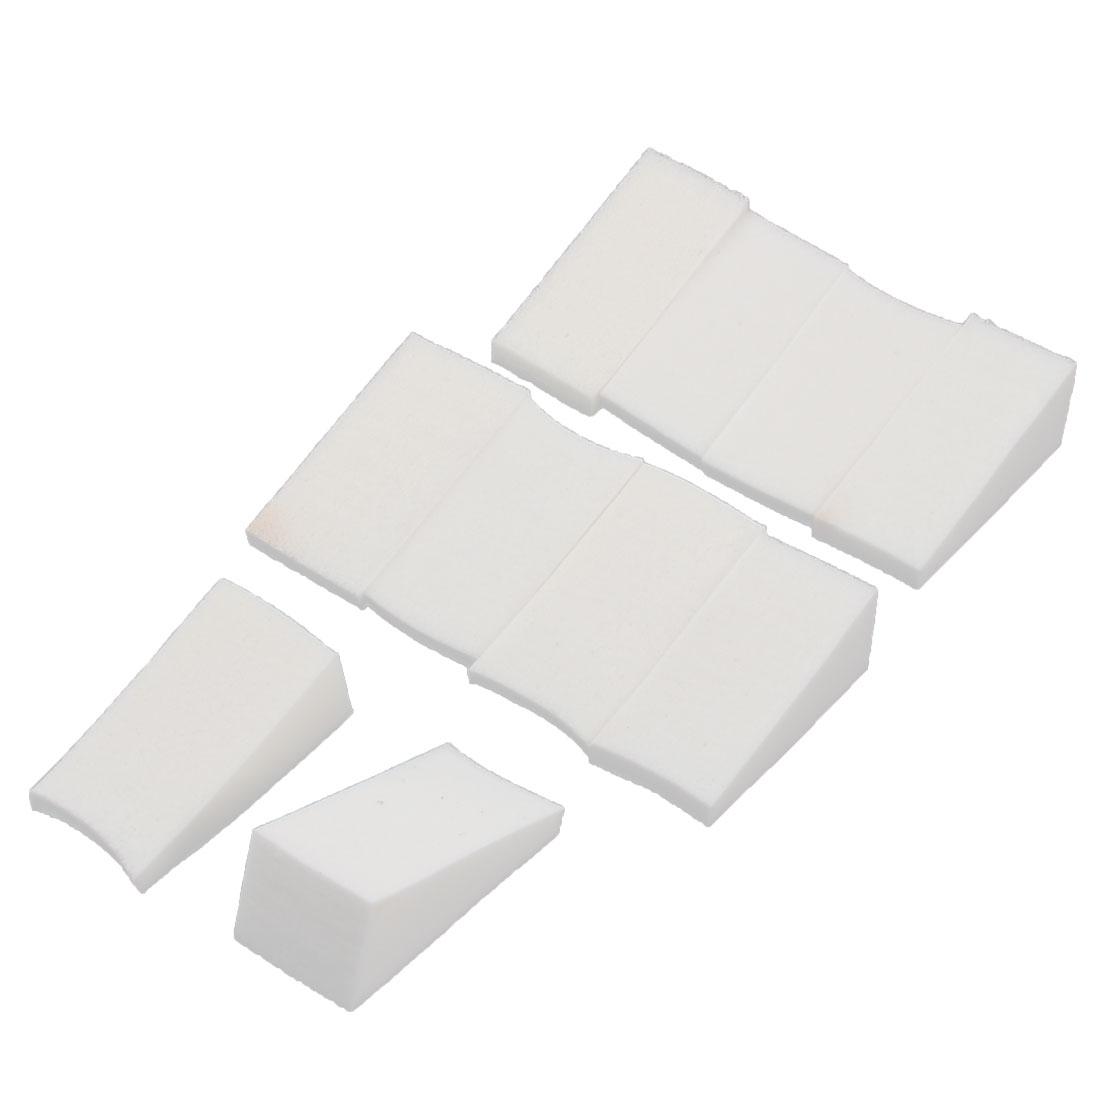 Gradient Wedge Shaped Soft Creative Nail Art Manicure Nail Sponge White 10 PCS